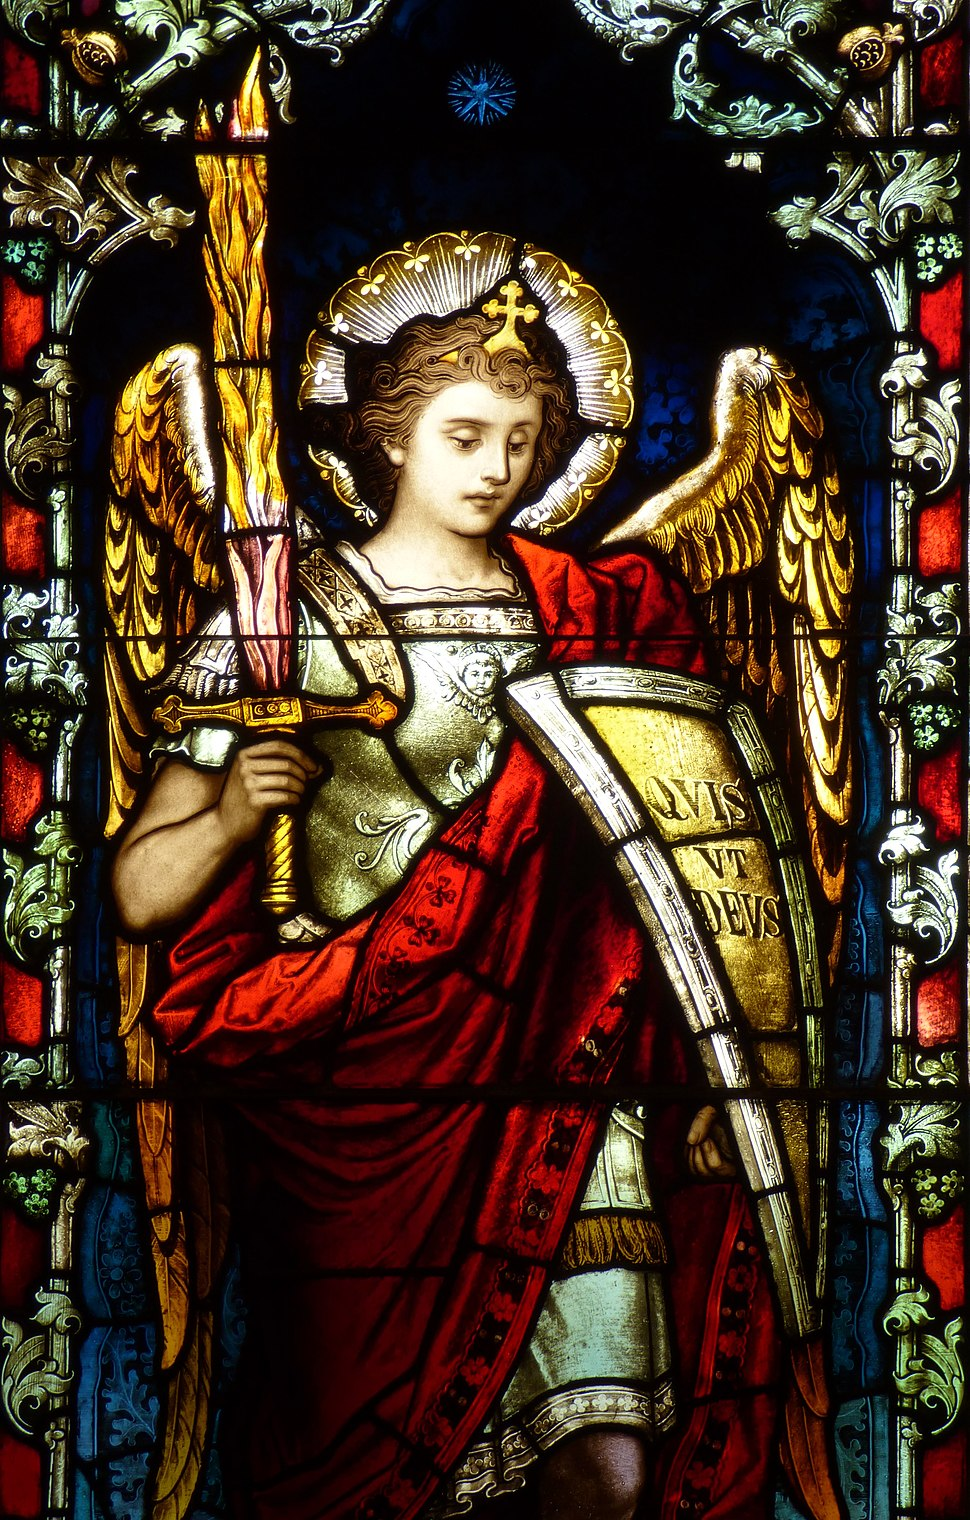 St. Stephen the Martyr (Omaha), chapel window 2, Archangel Michael, detail